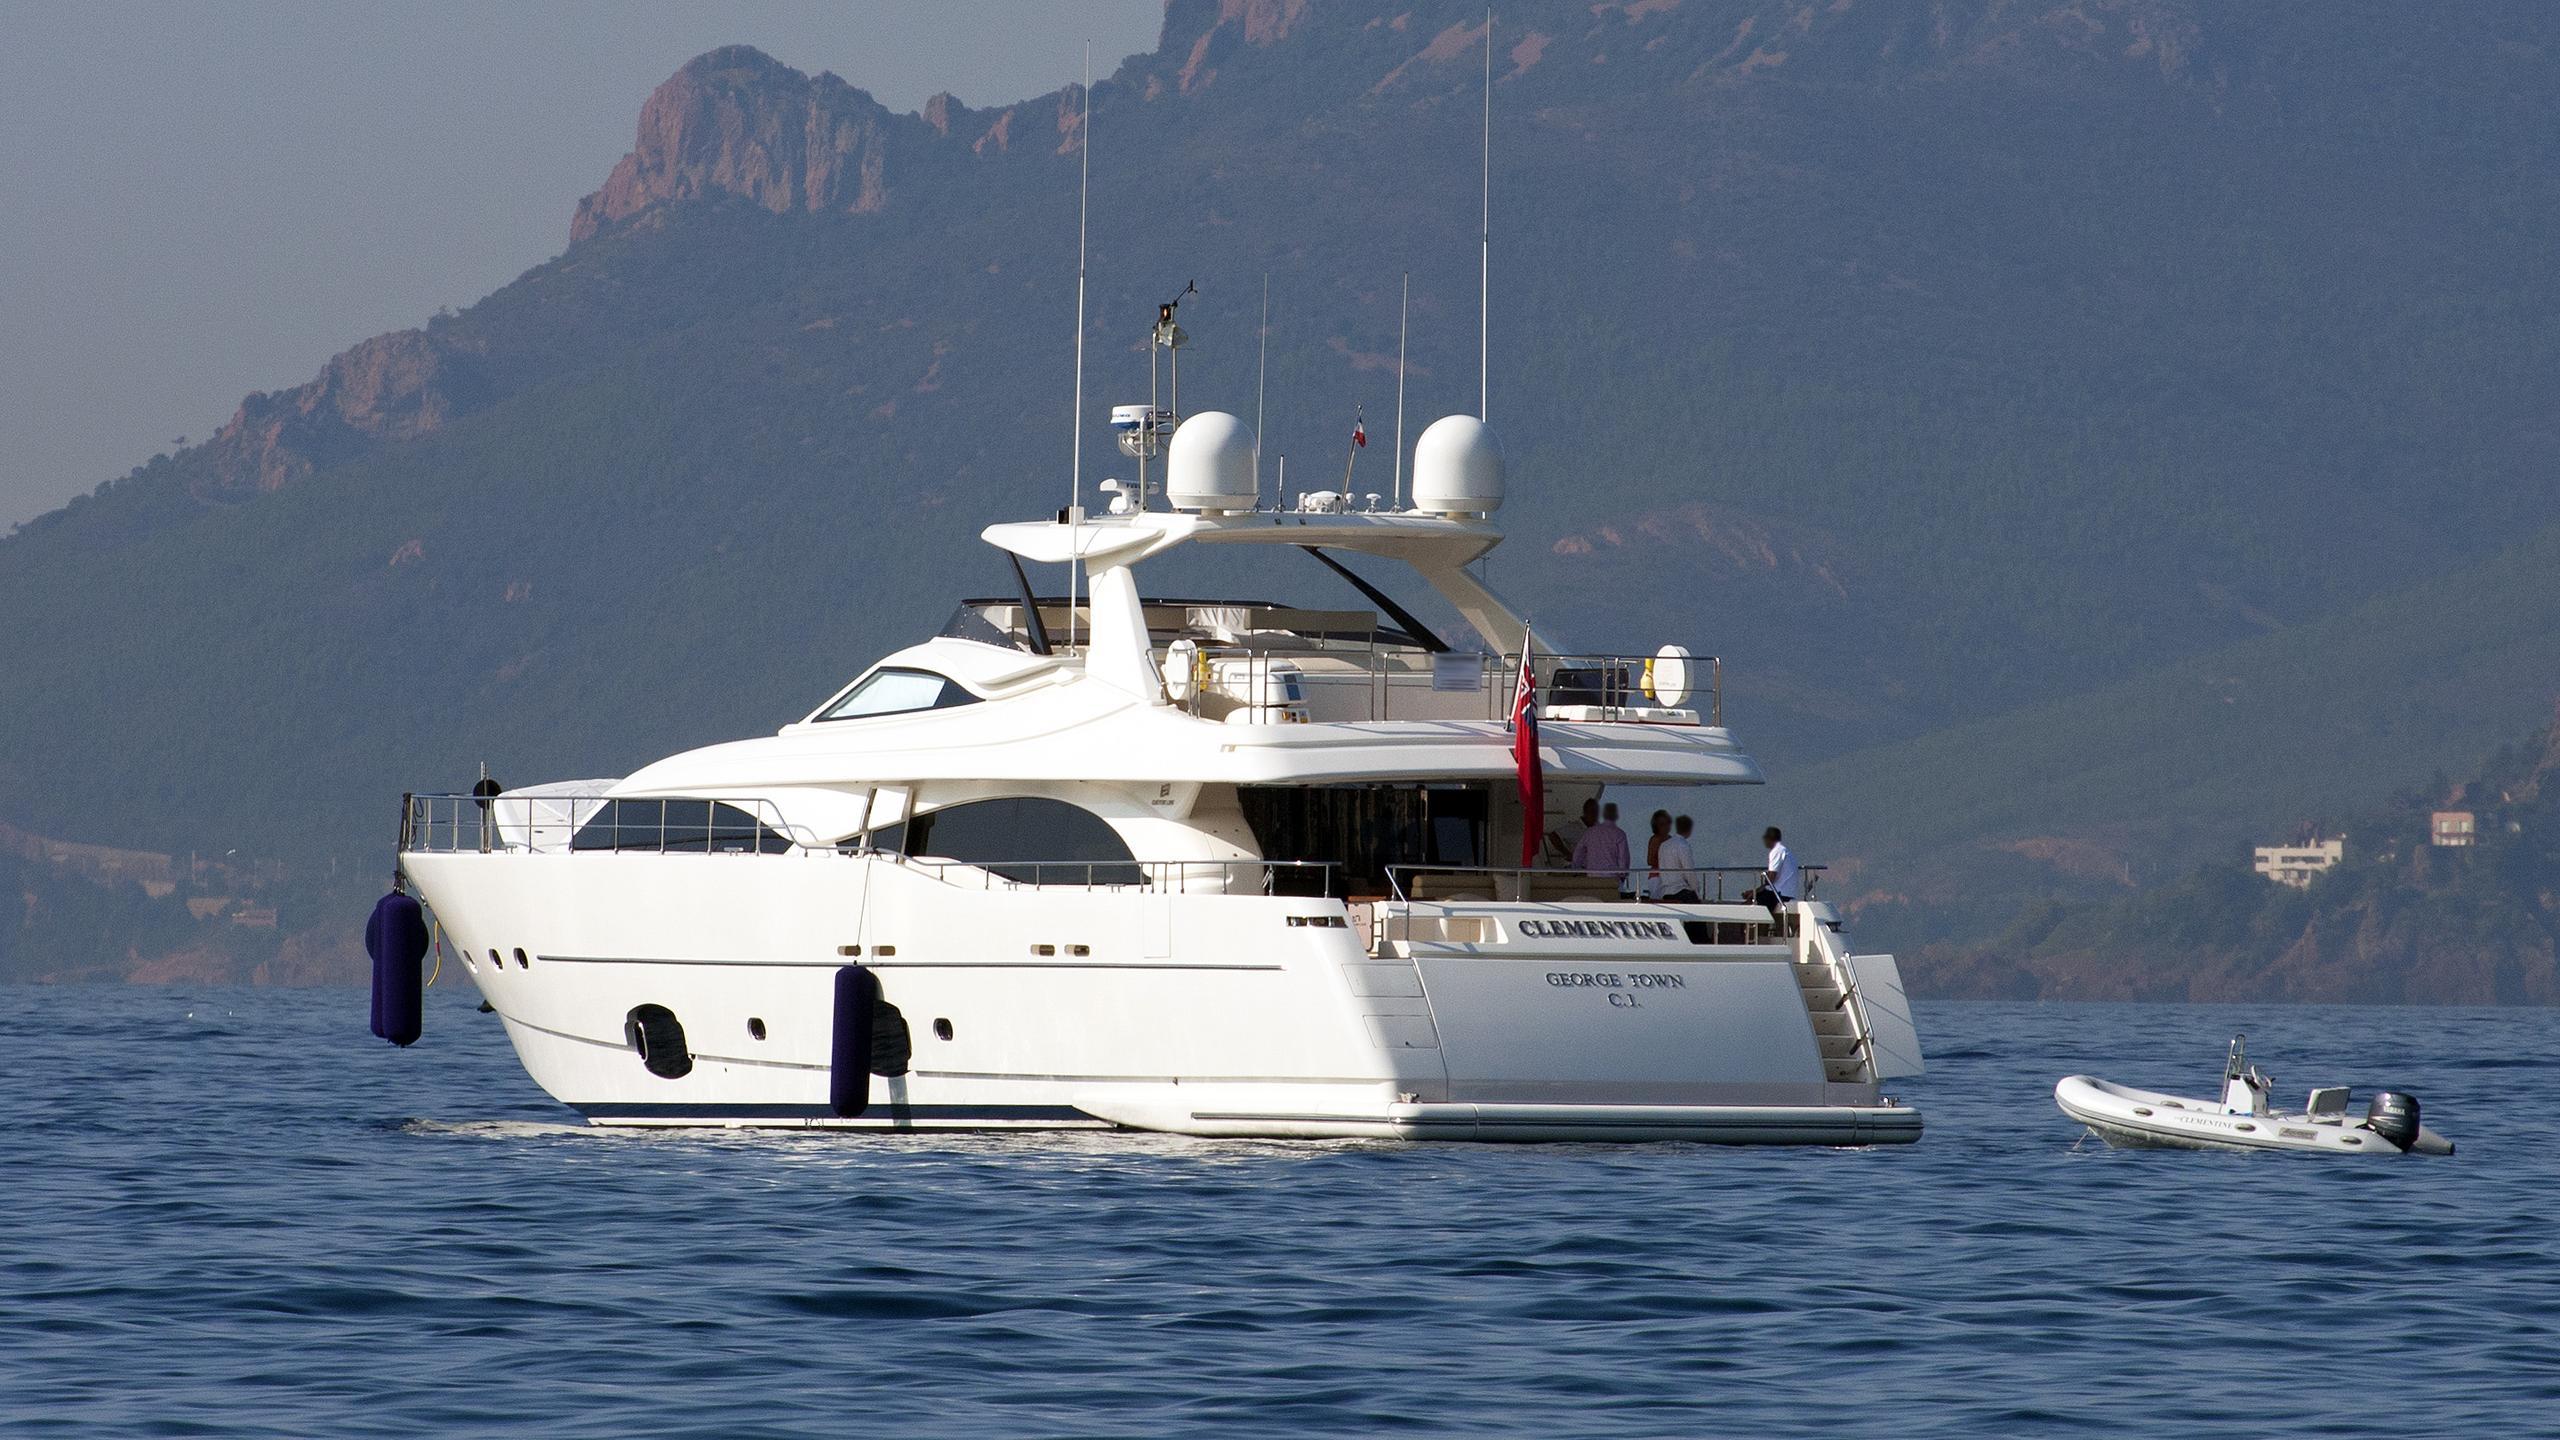 clementine-motor-yacht-ferretti-custom-line-97-2007-30m-stern